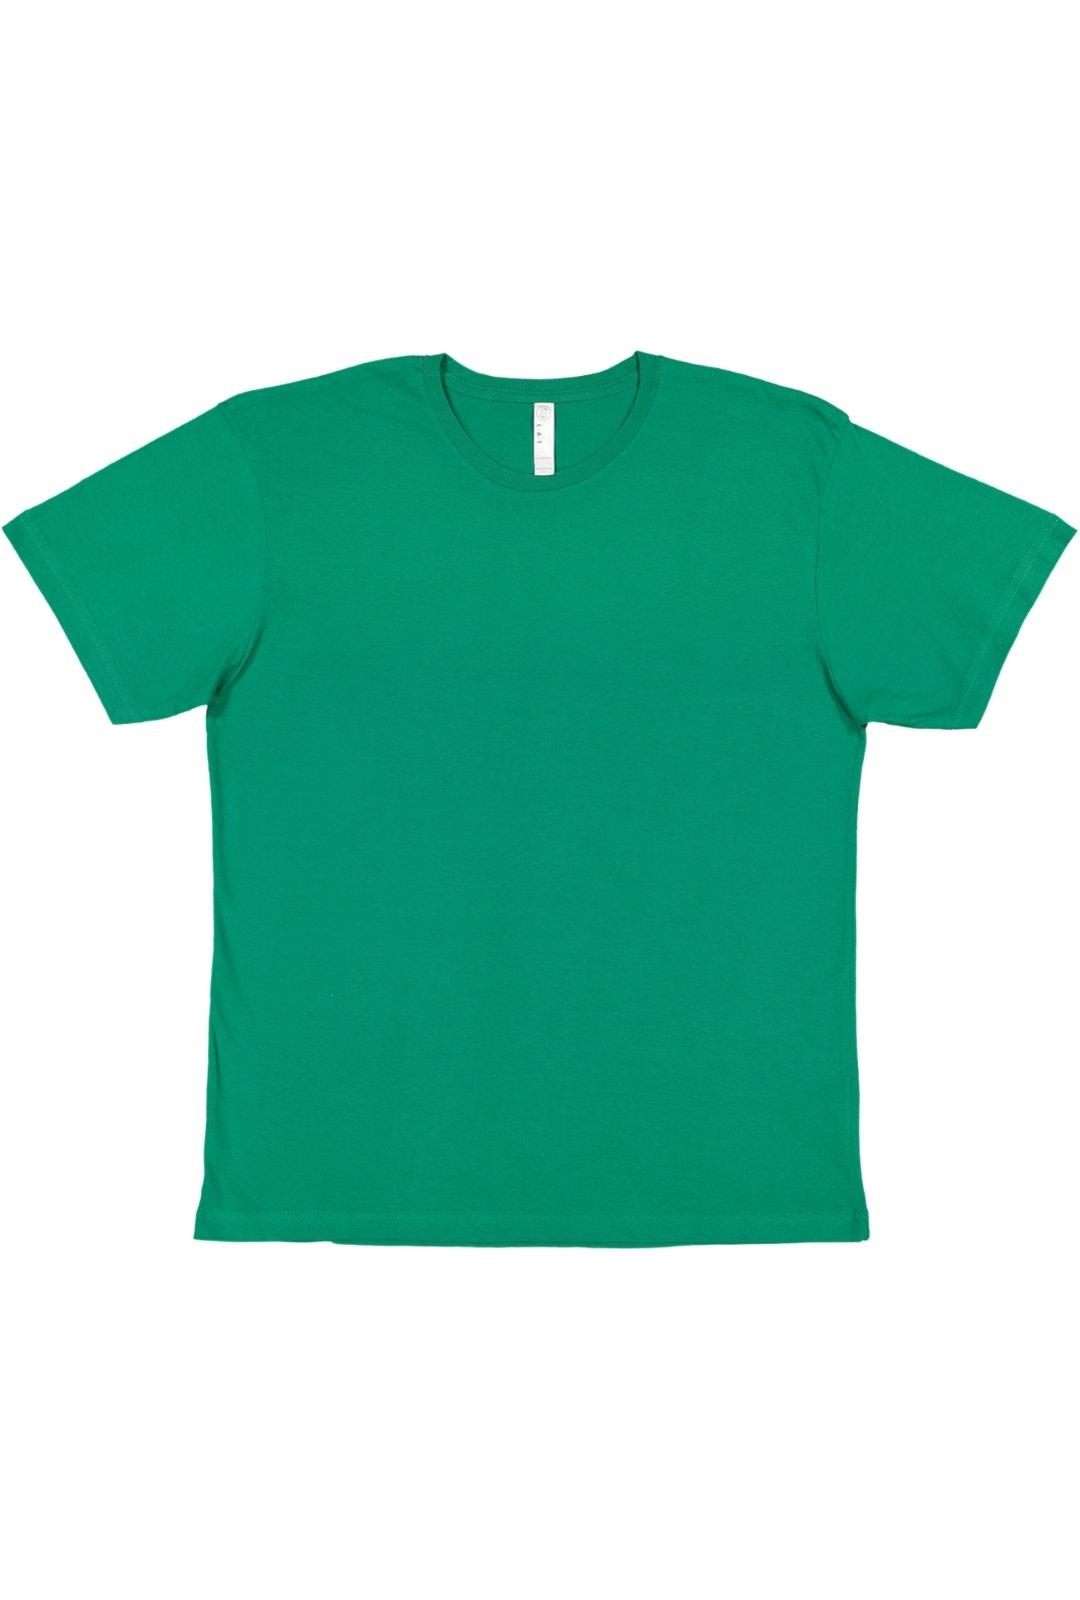 LAT Men's 60/40 Cotton/Polyester Vintage Heathered Jersey Crew Neck Short Sleeve Tee